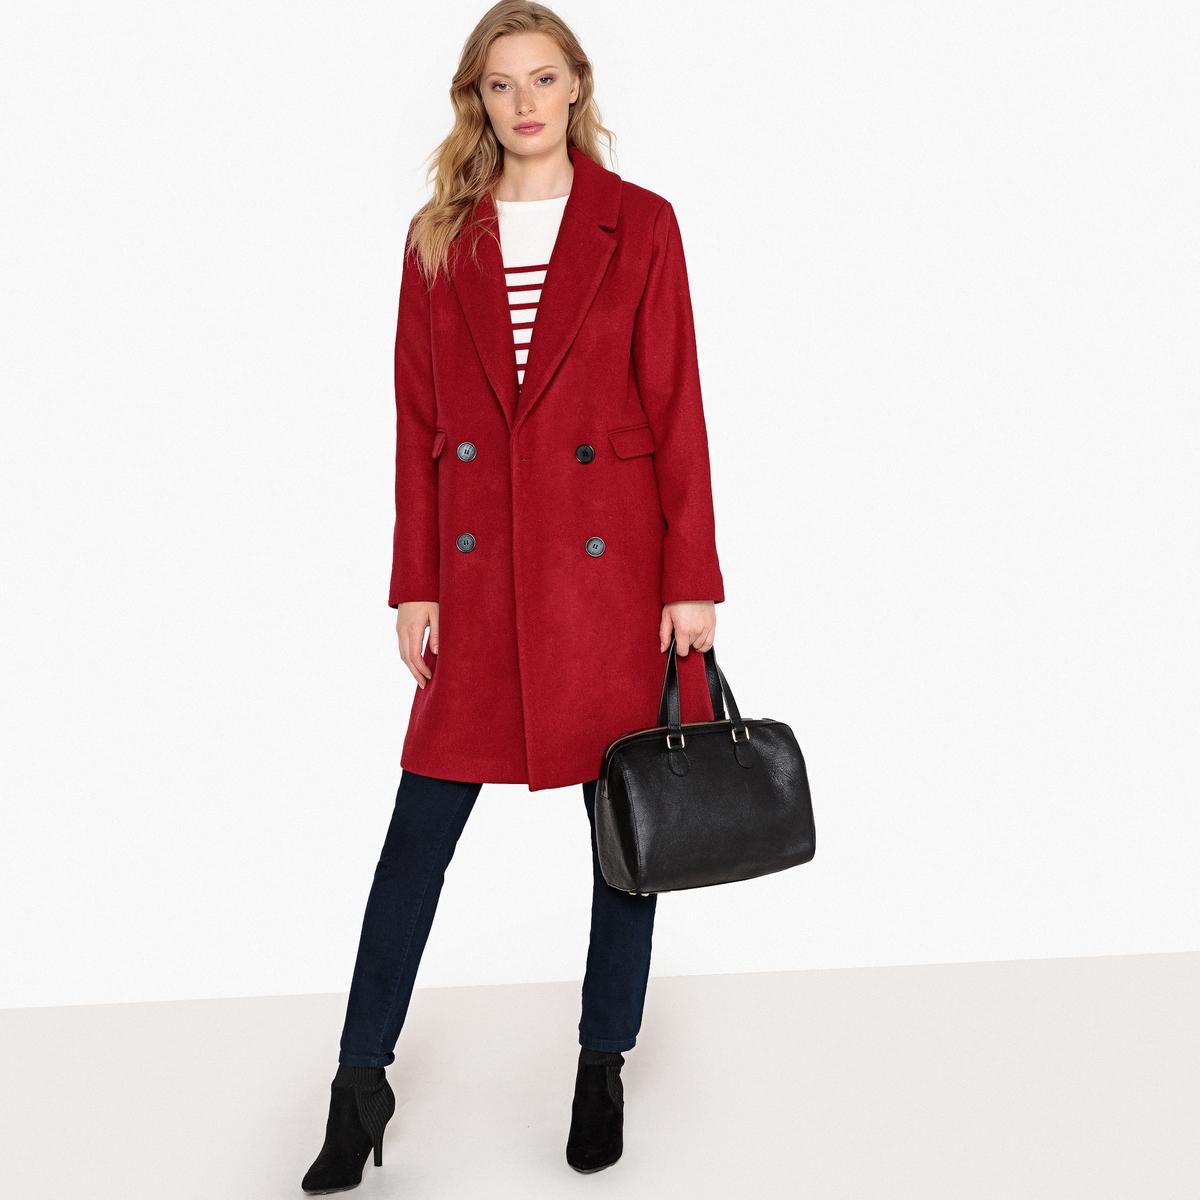 Abrigo masculino 3/4 de lana mezclada